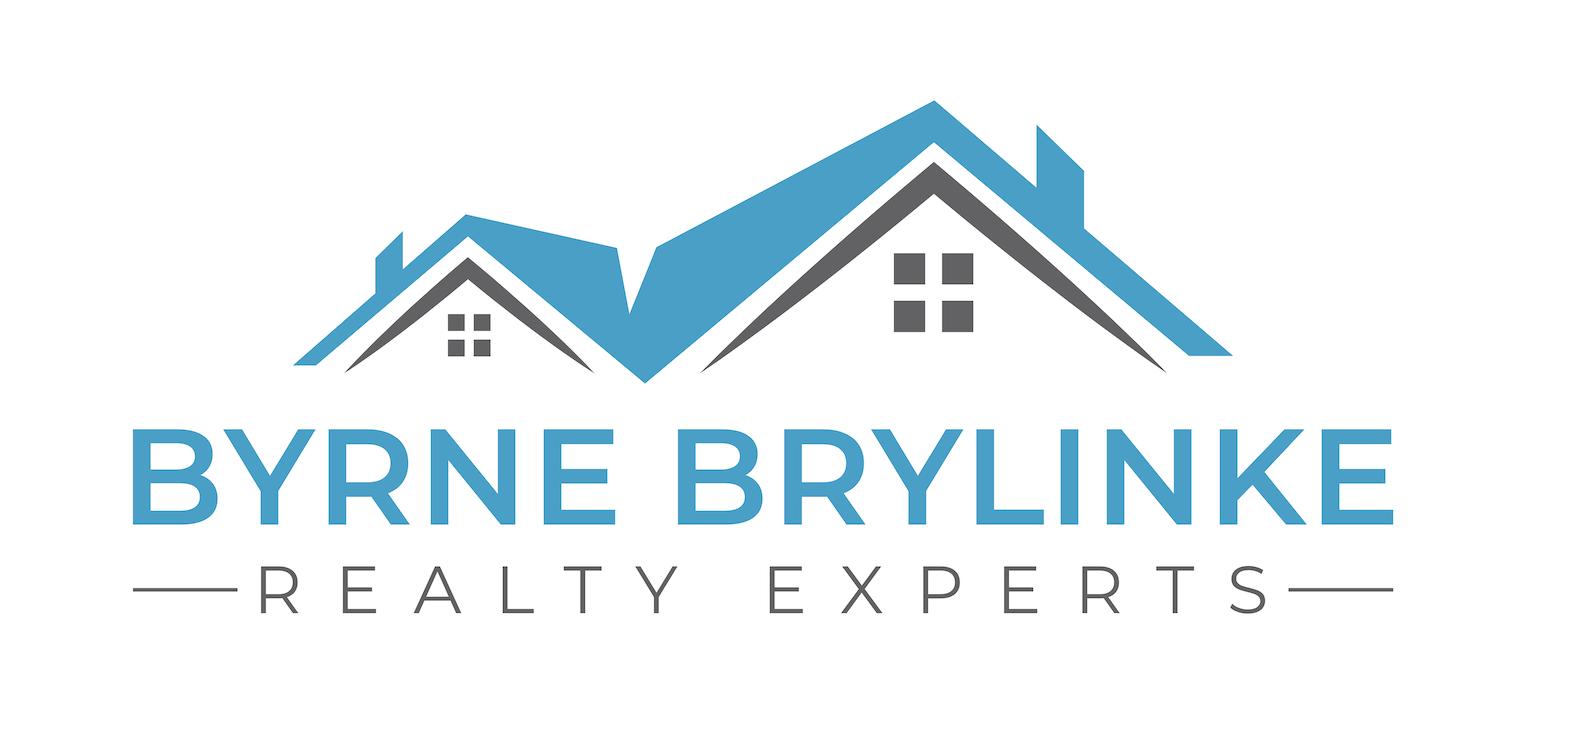 Byrne Brylinke Team @ Realty Experts